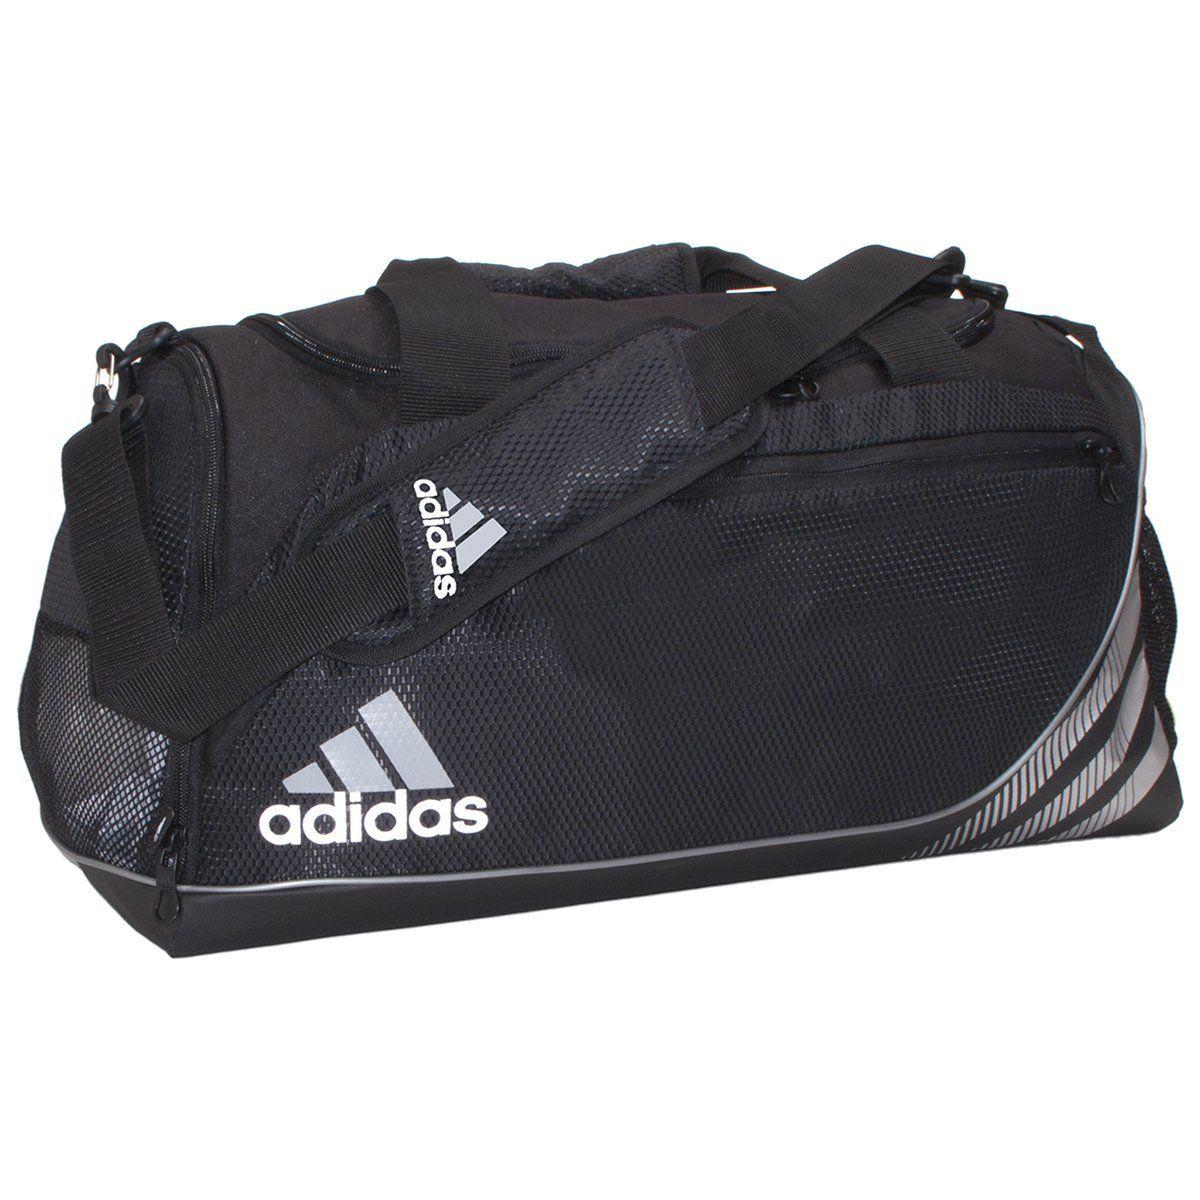 Adidas Team Speed Duffel Bag Medium   Top Best Spot   Pinterest ... 6f73f0b619